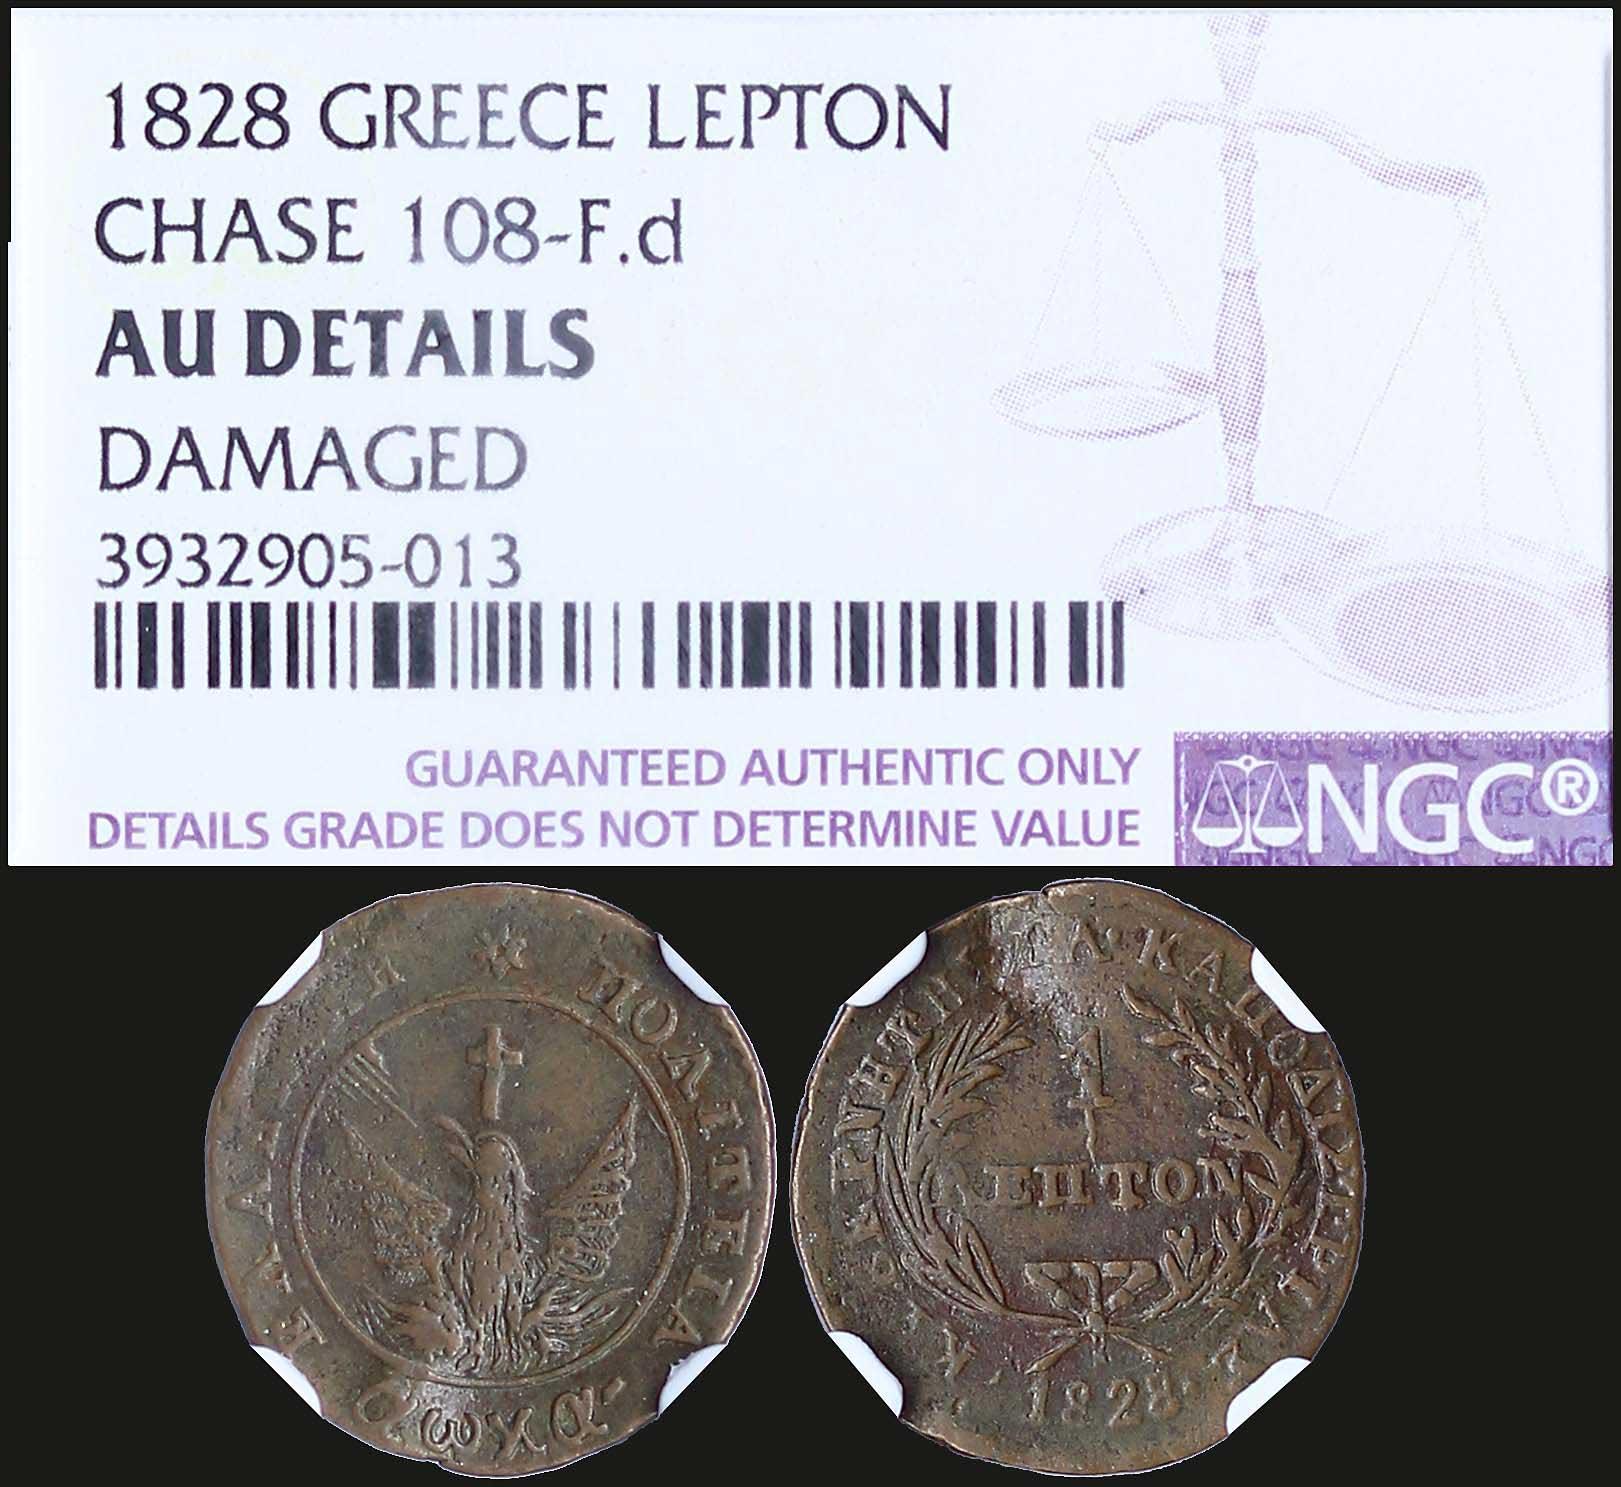 Lot 6039 - -  COINS & TOKENS governor capodistrias -  A. Karamitsos Public & Live Internet Auction 682 (Part A) Coins, Medals & Banknotes